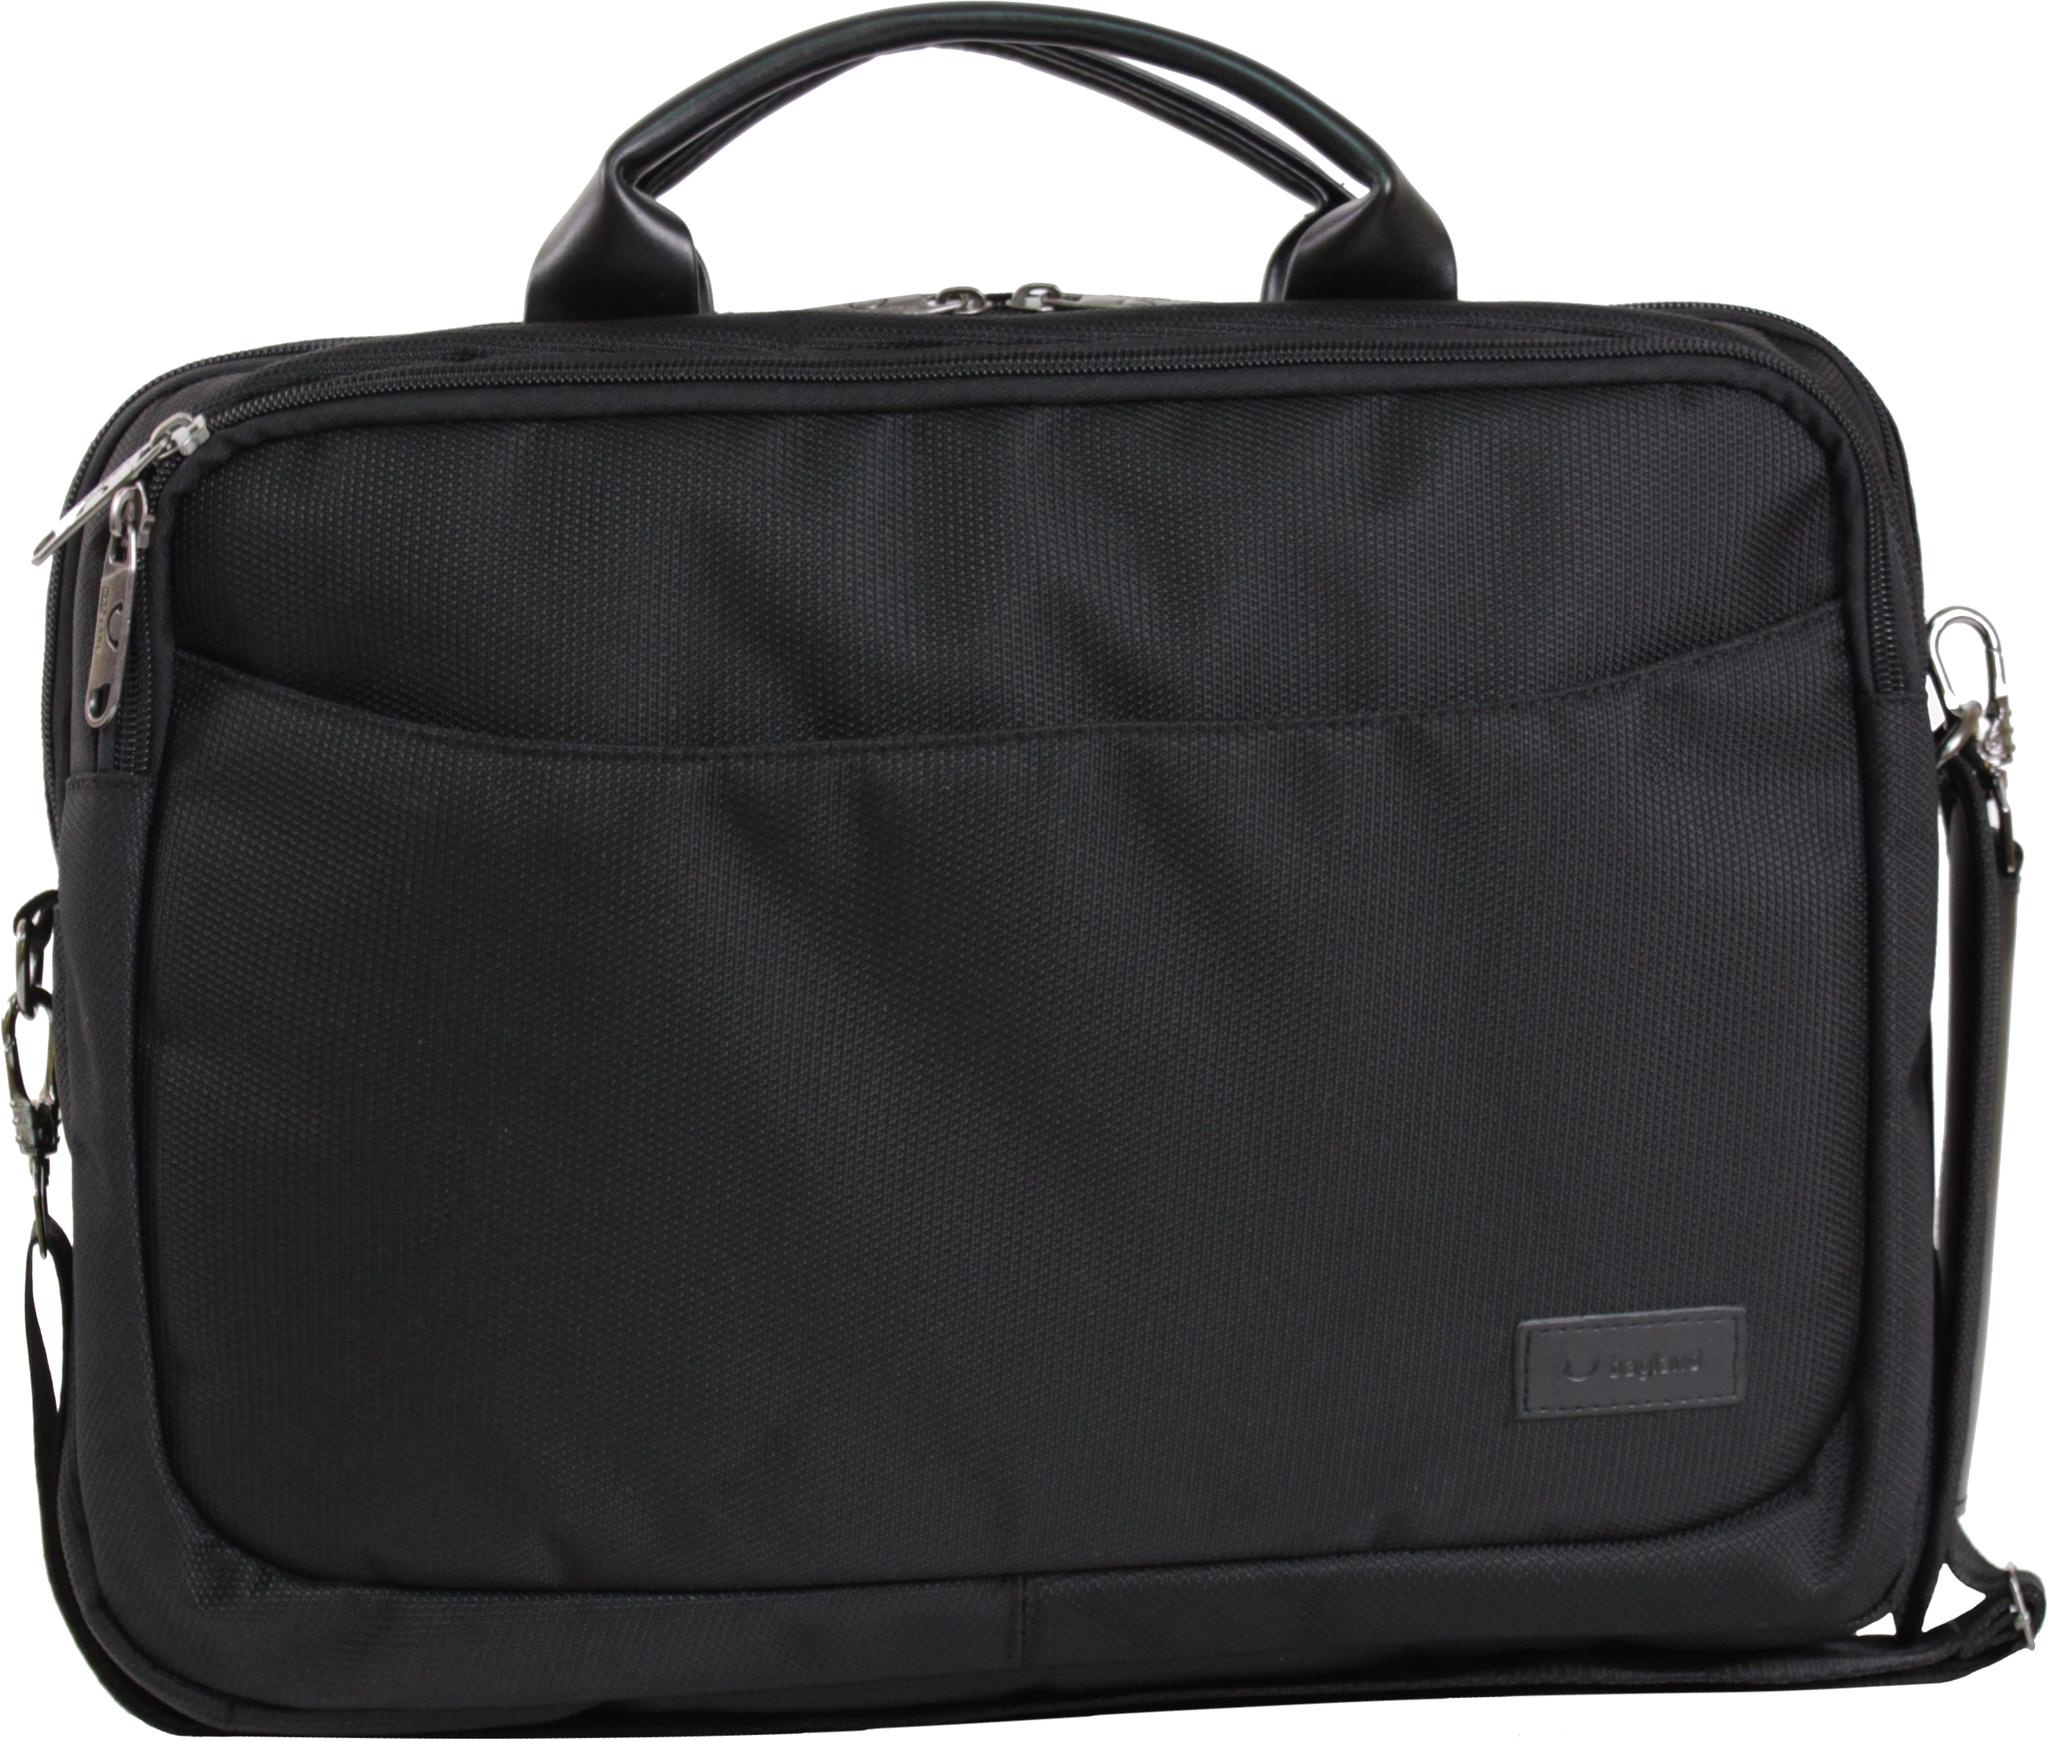 Сумки для ноутбука Сумка для ноутбука Bagland Fremont 11 л. Чёрный (0042780) IMG_0813.JPG